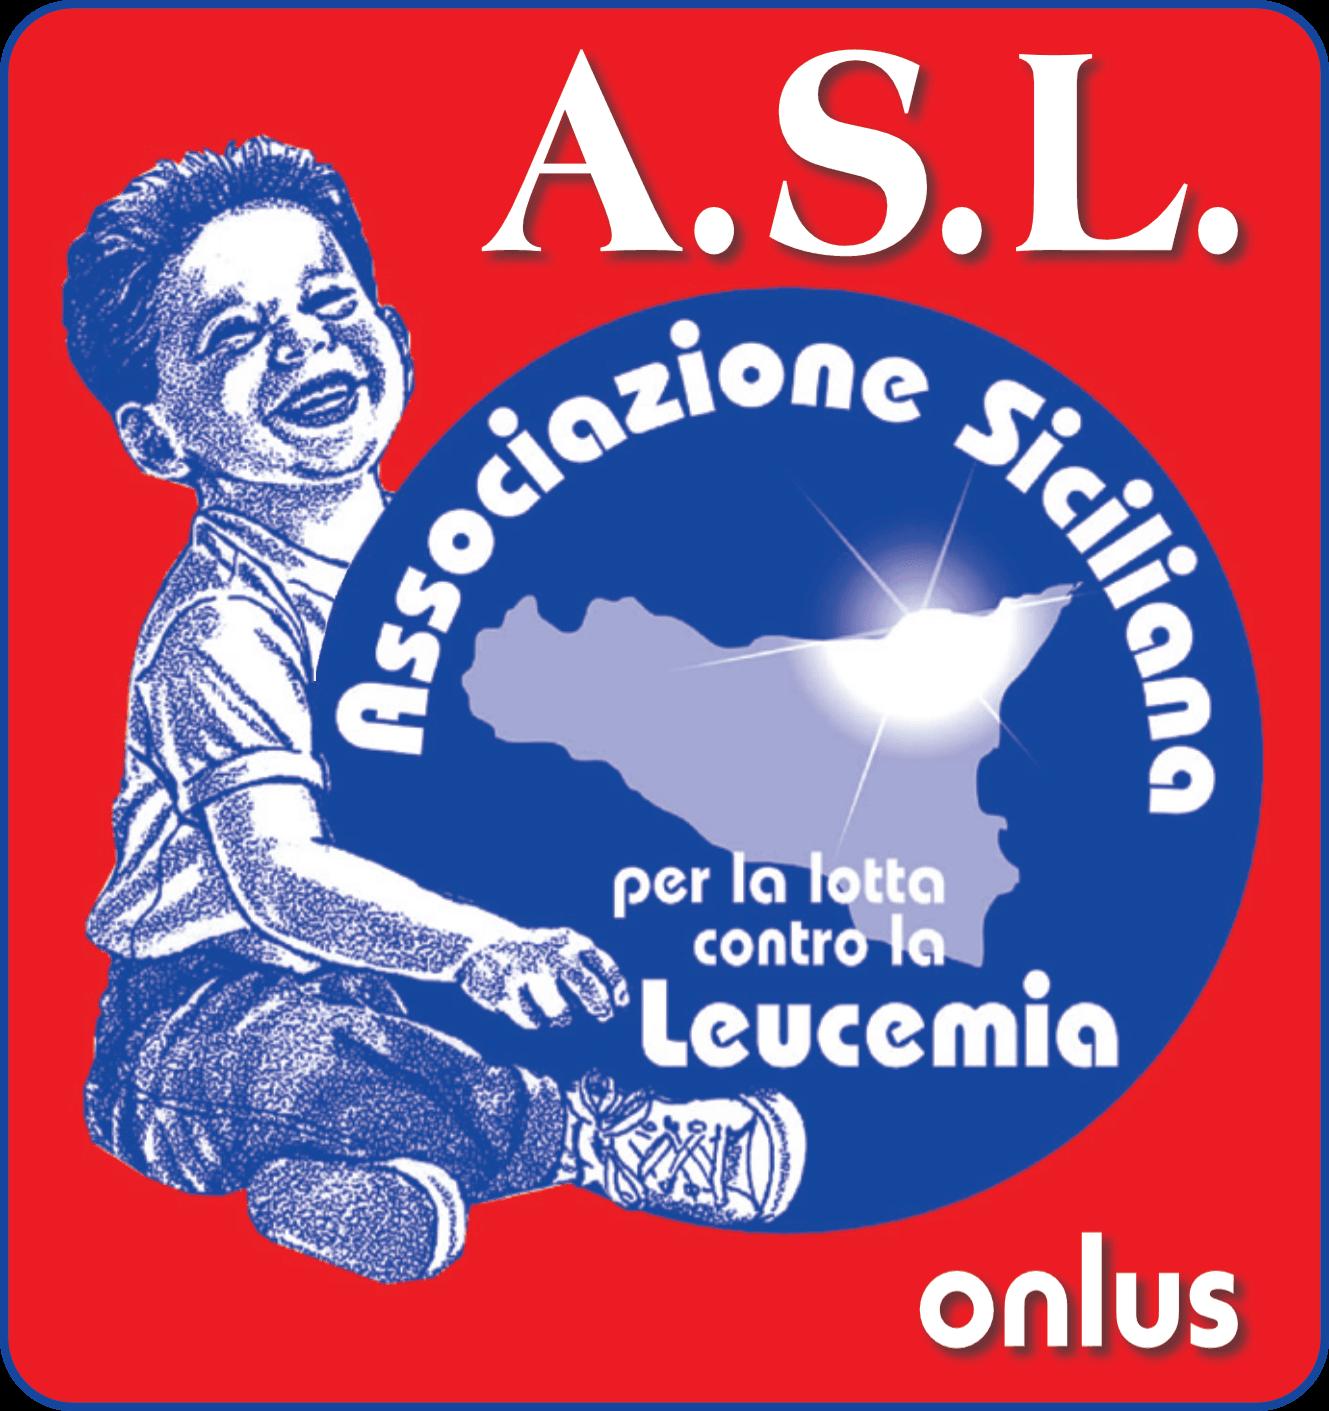 A.S.L. – Associazione Siciliana Leucemia ONLUS